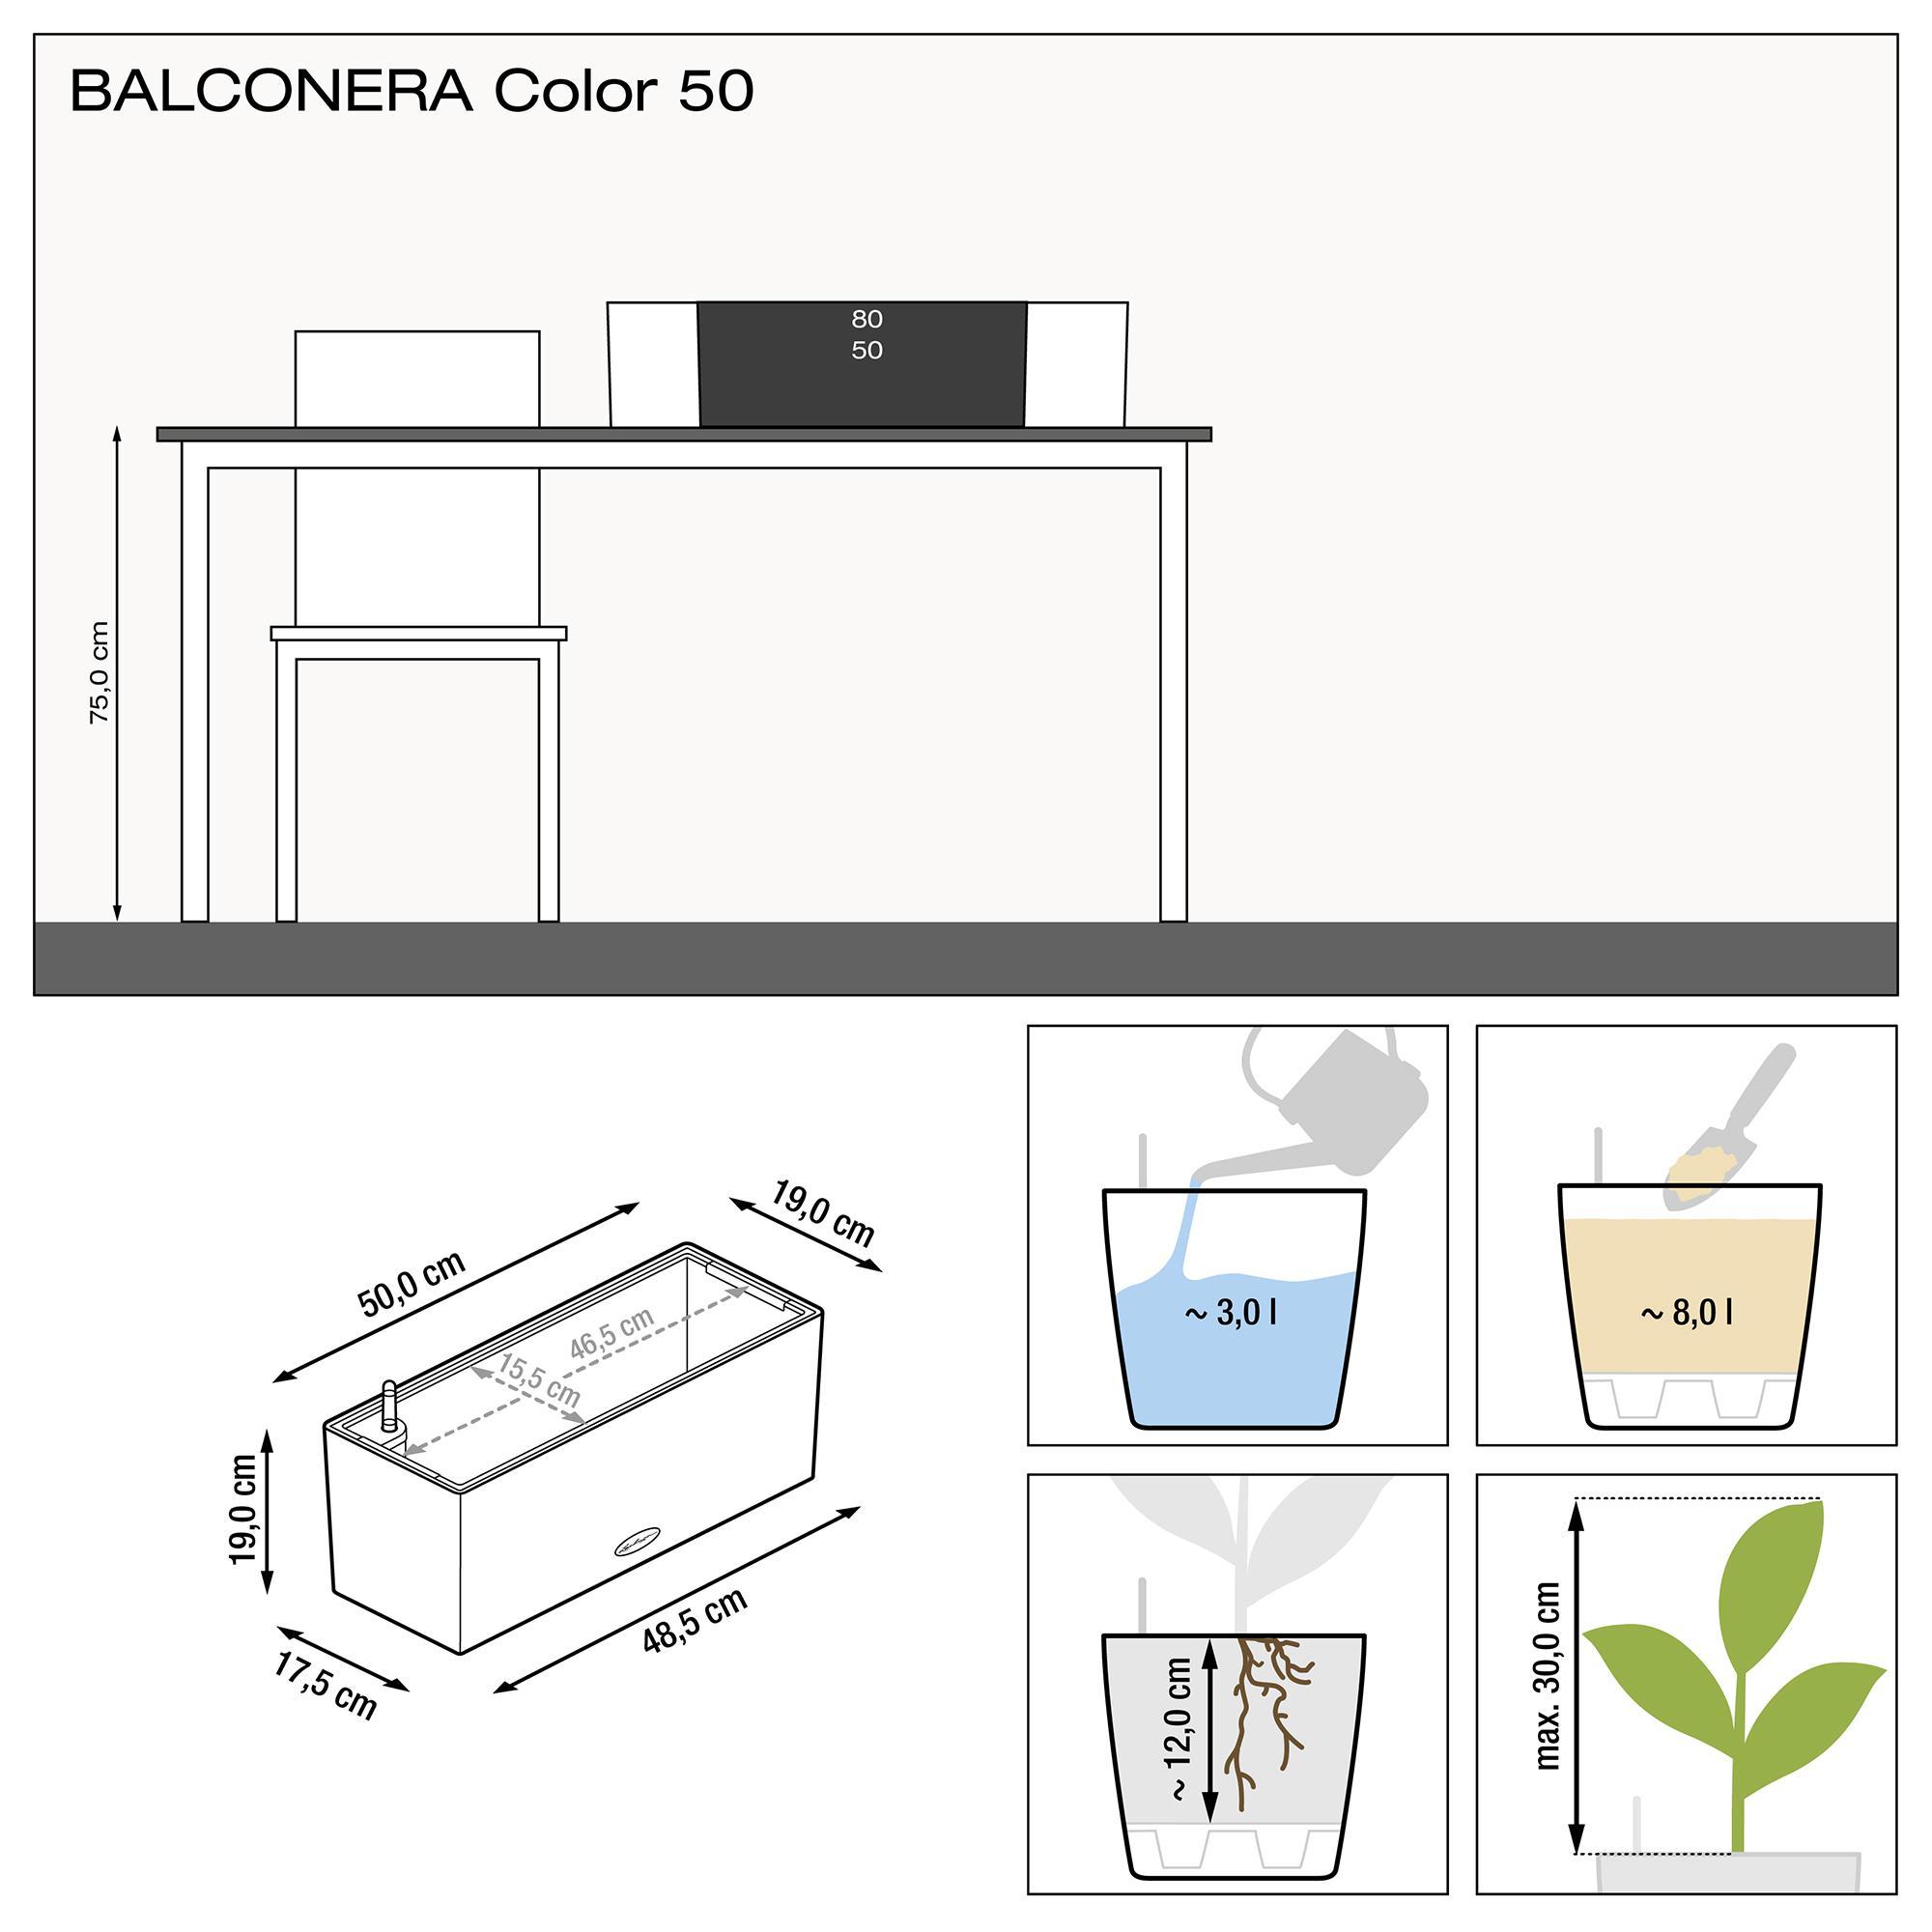 BALCONERA Color 50 karibikblau - Bild 3